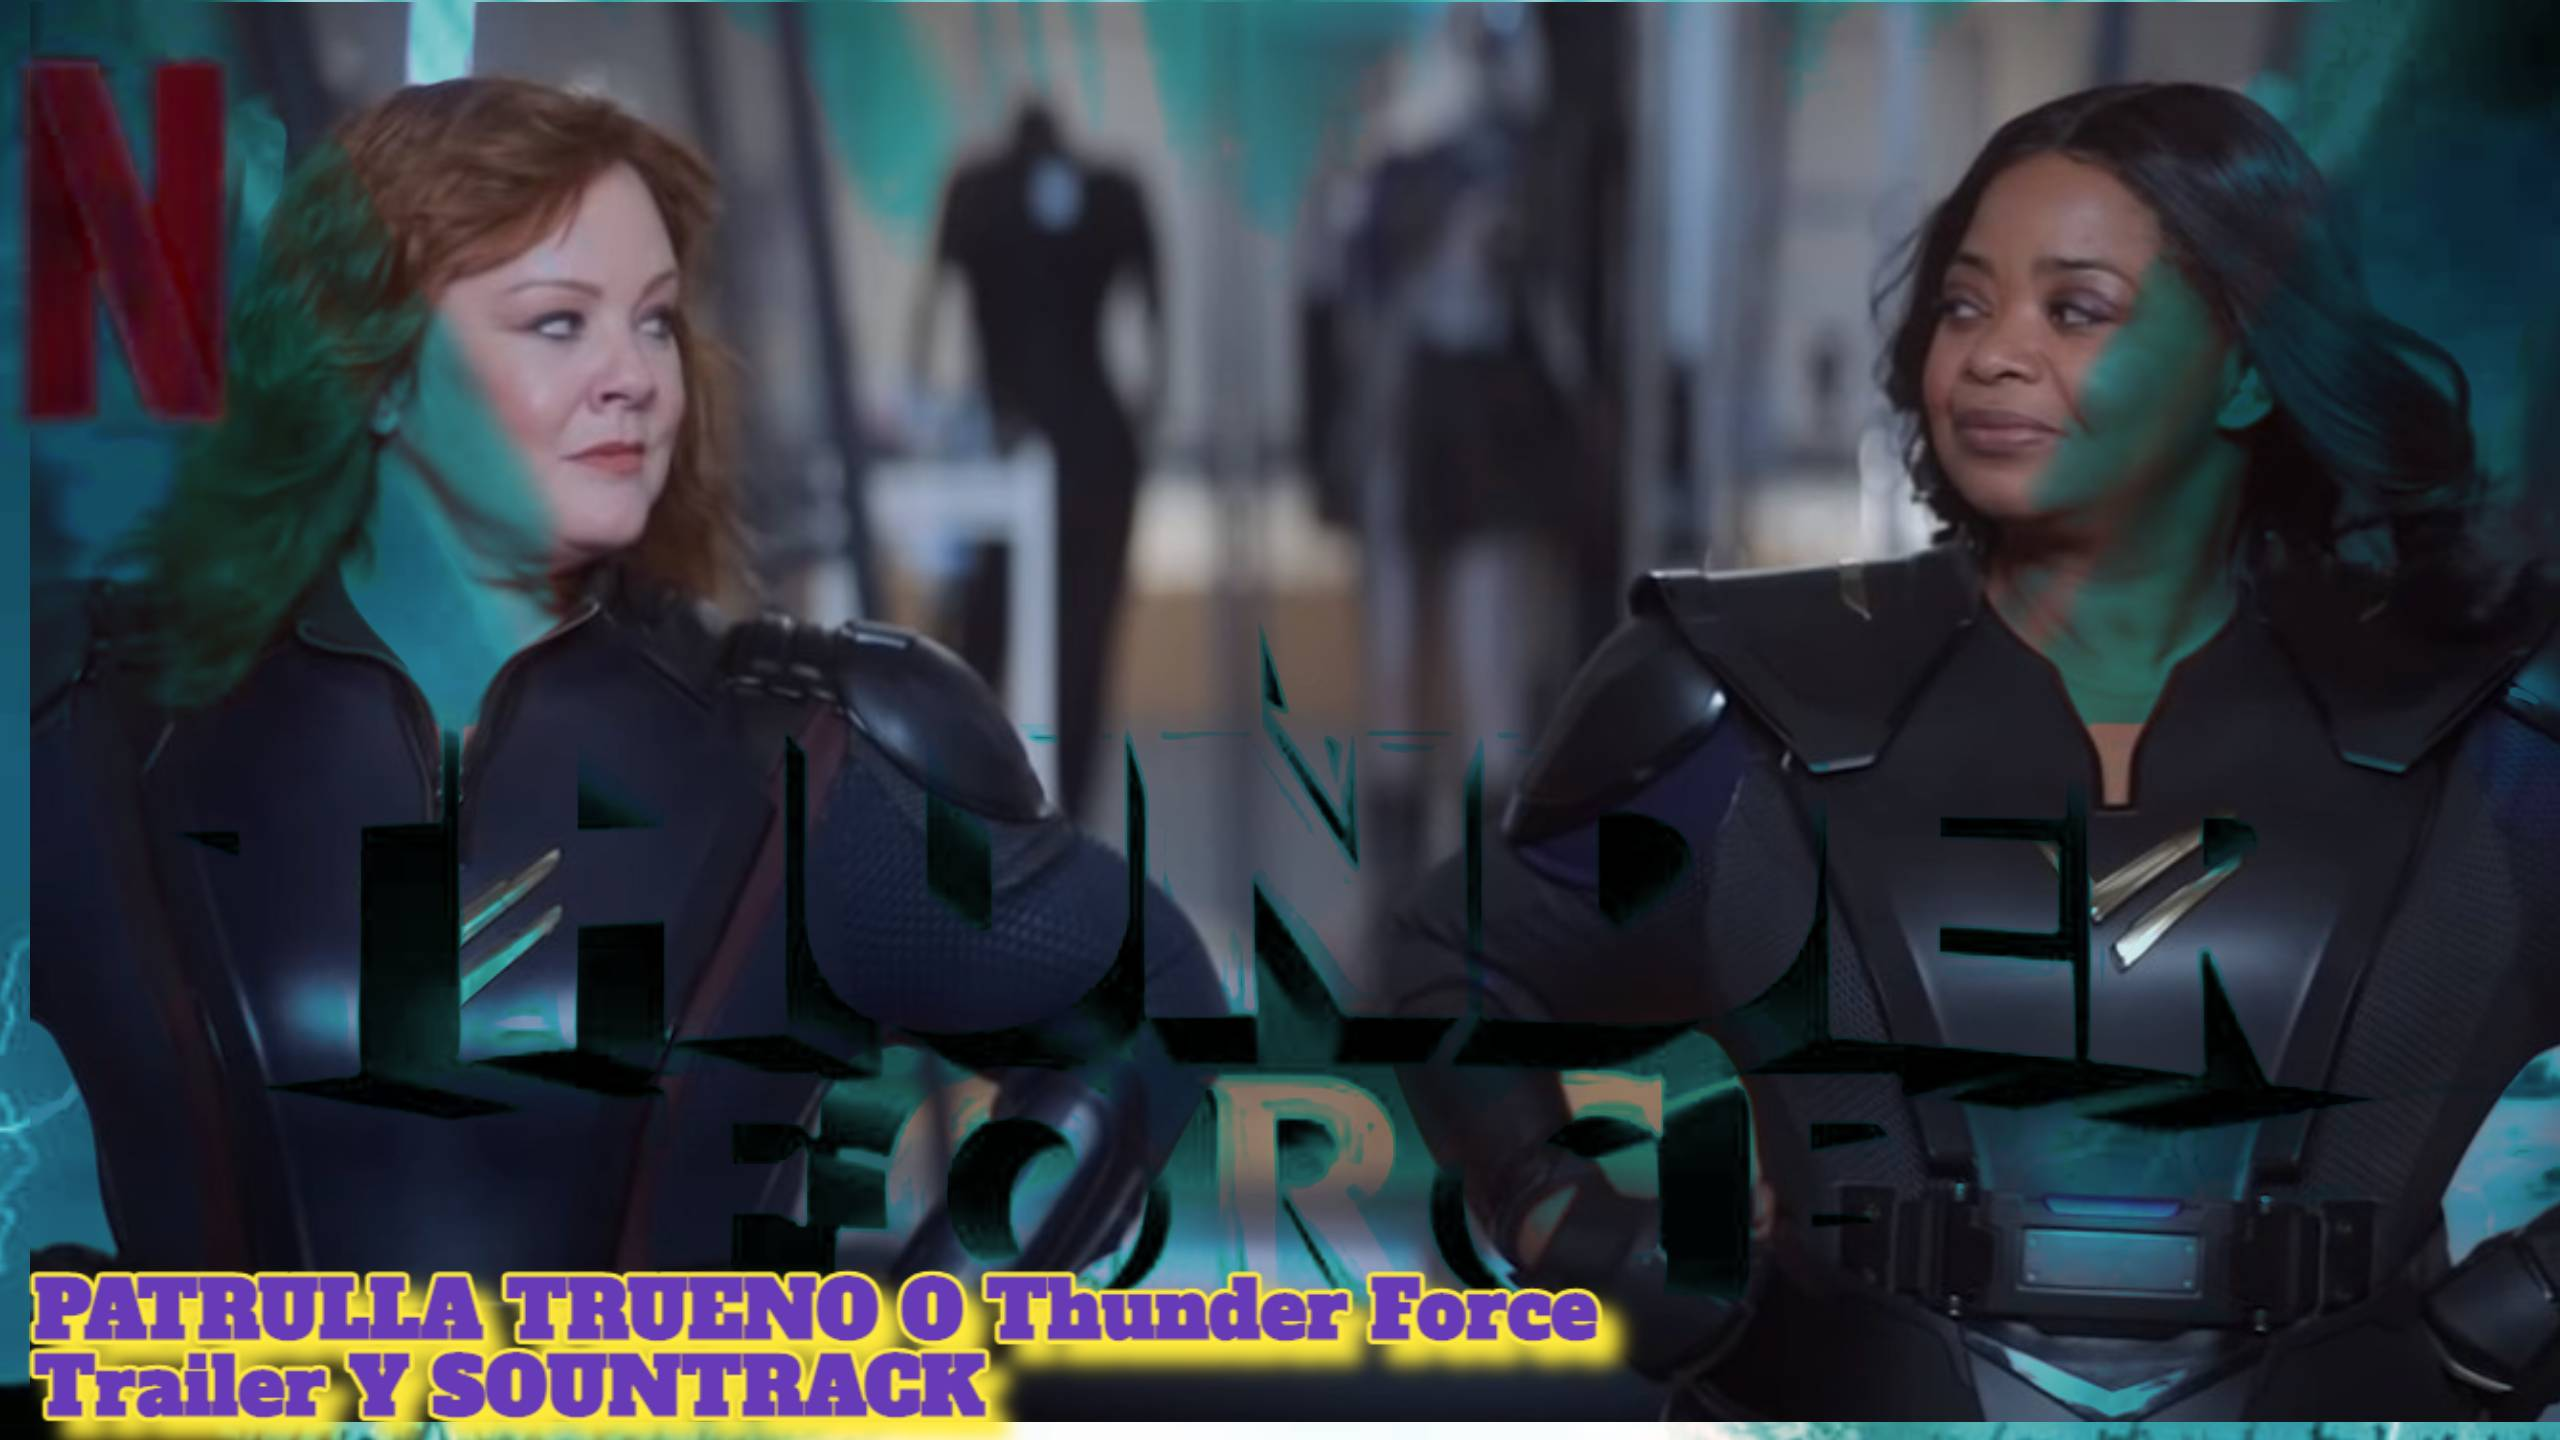 VER: PATRULLA TRUENO O Thunder Force Trailer Y SOUNTRACK